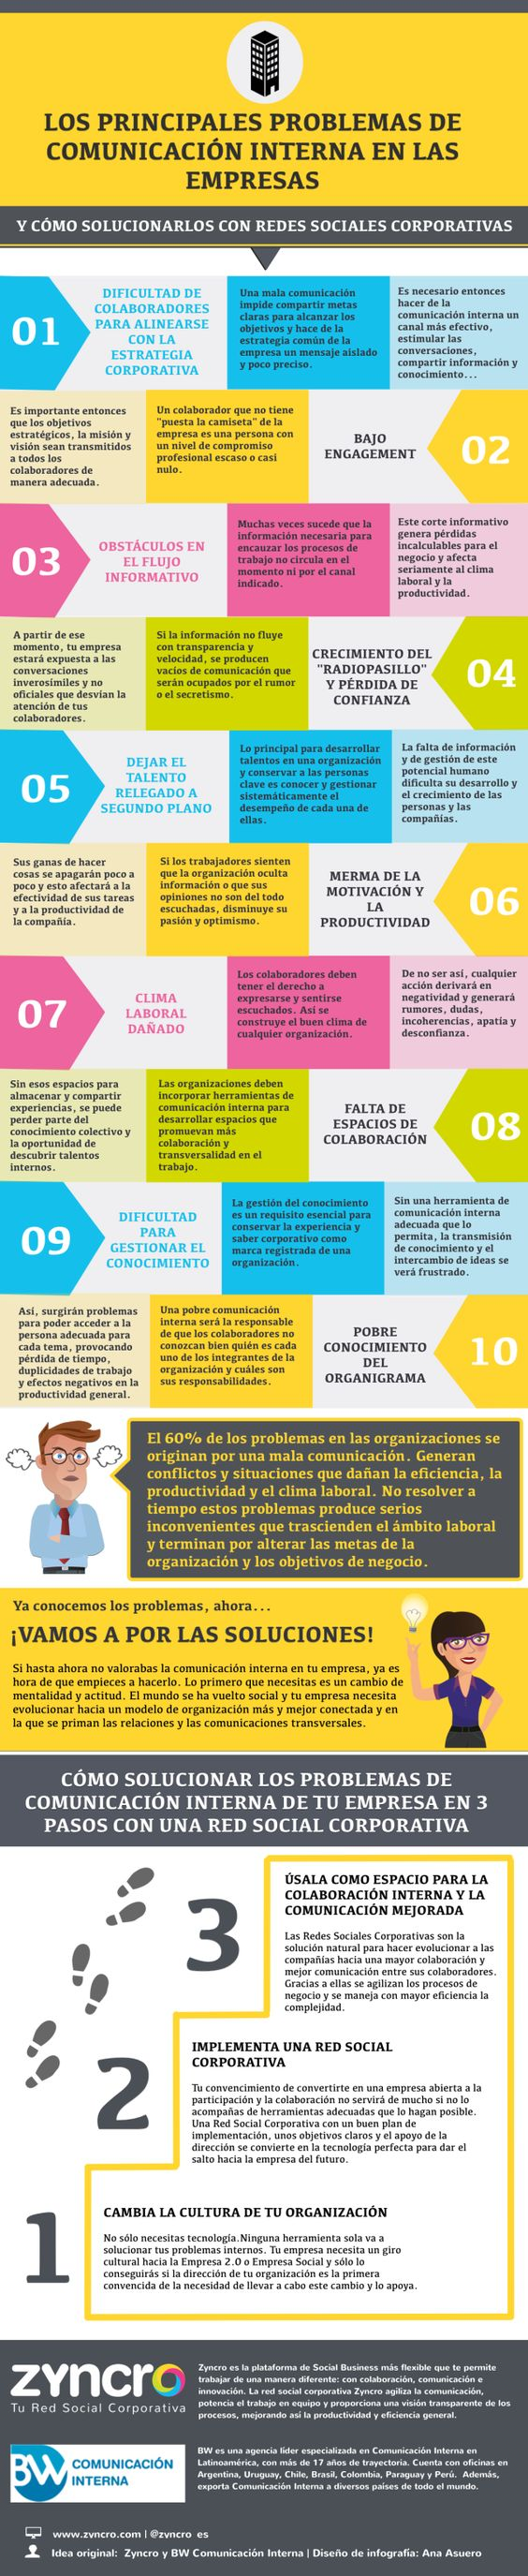 Principales problemas en comunicación interna de las empresas #infografia #infographic: